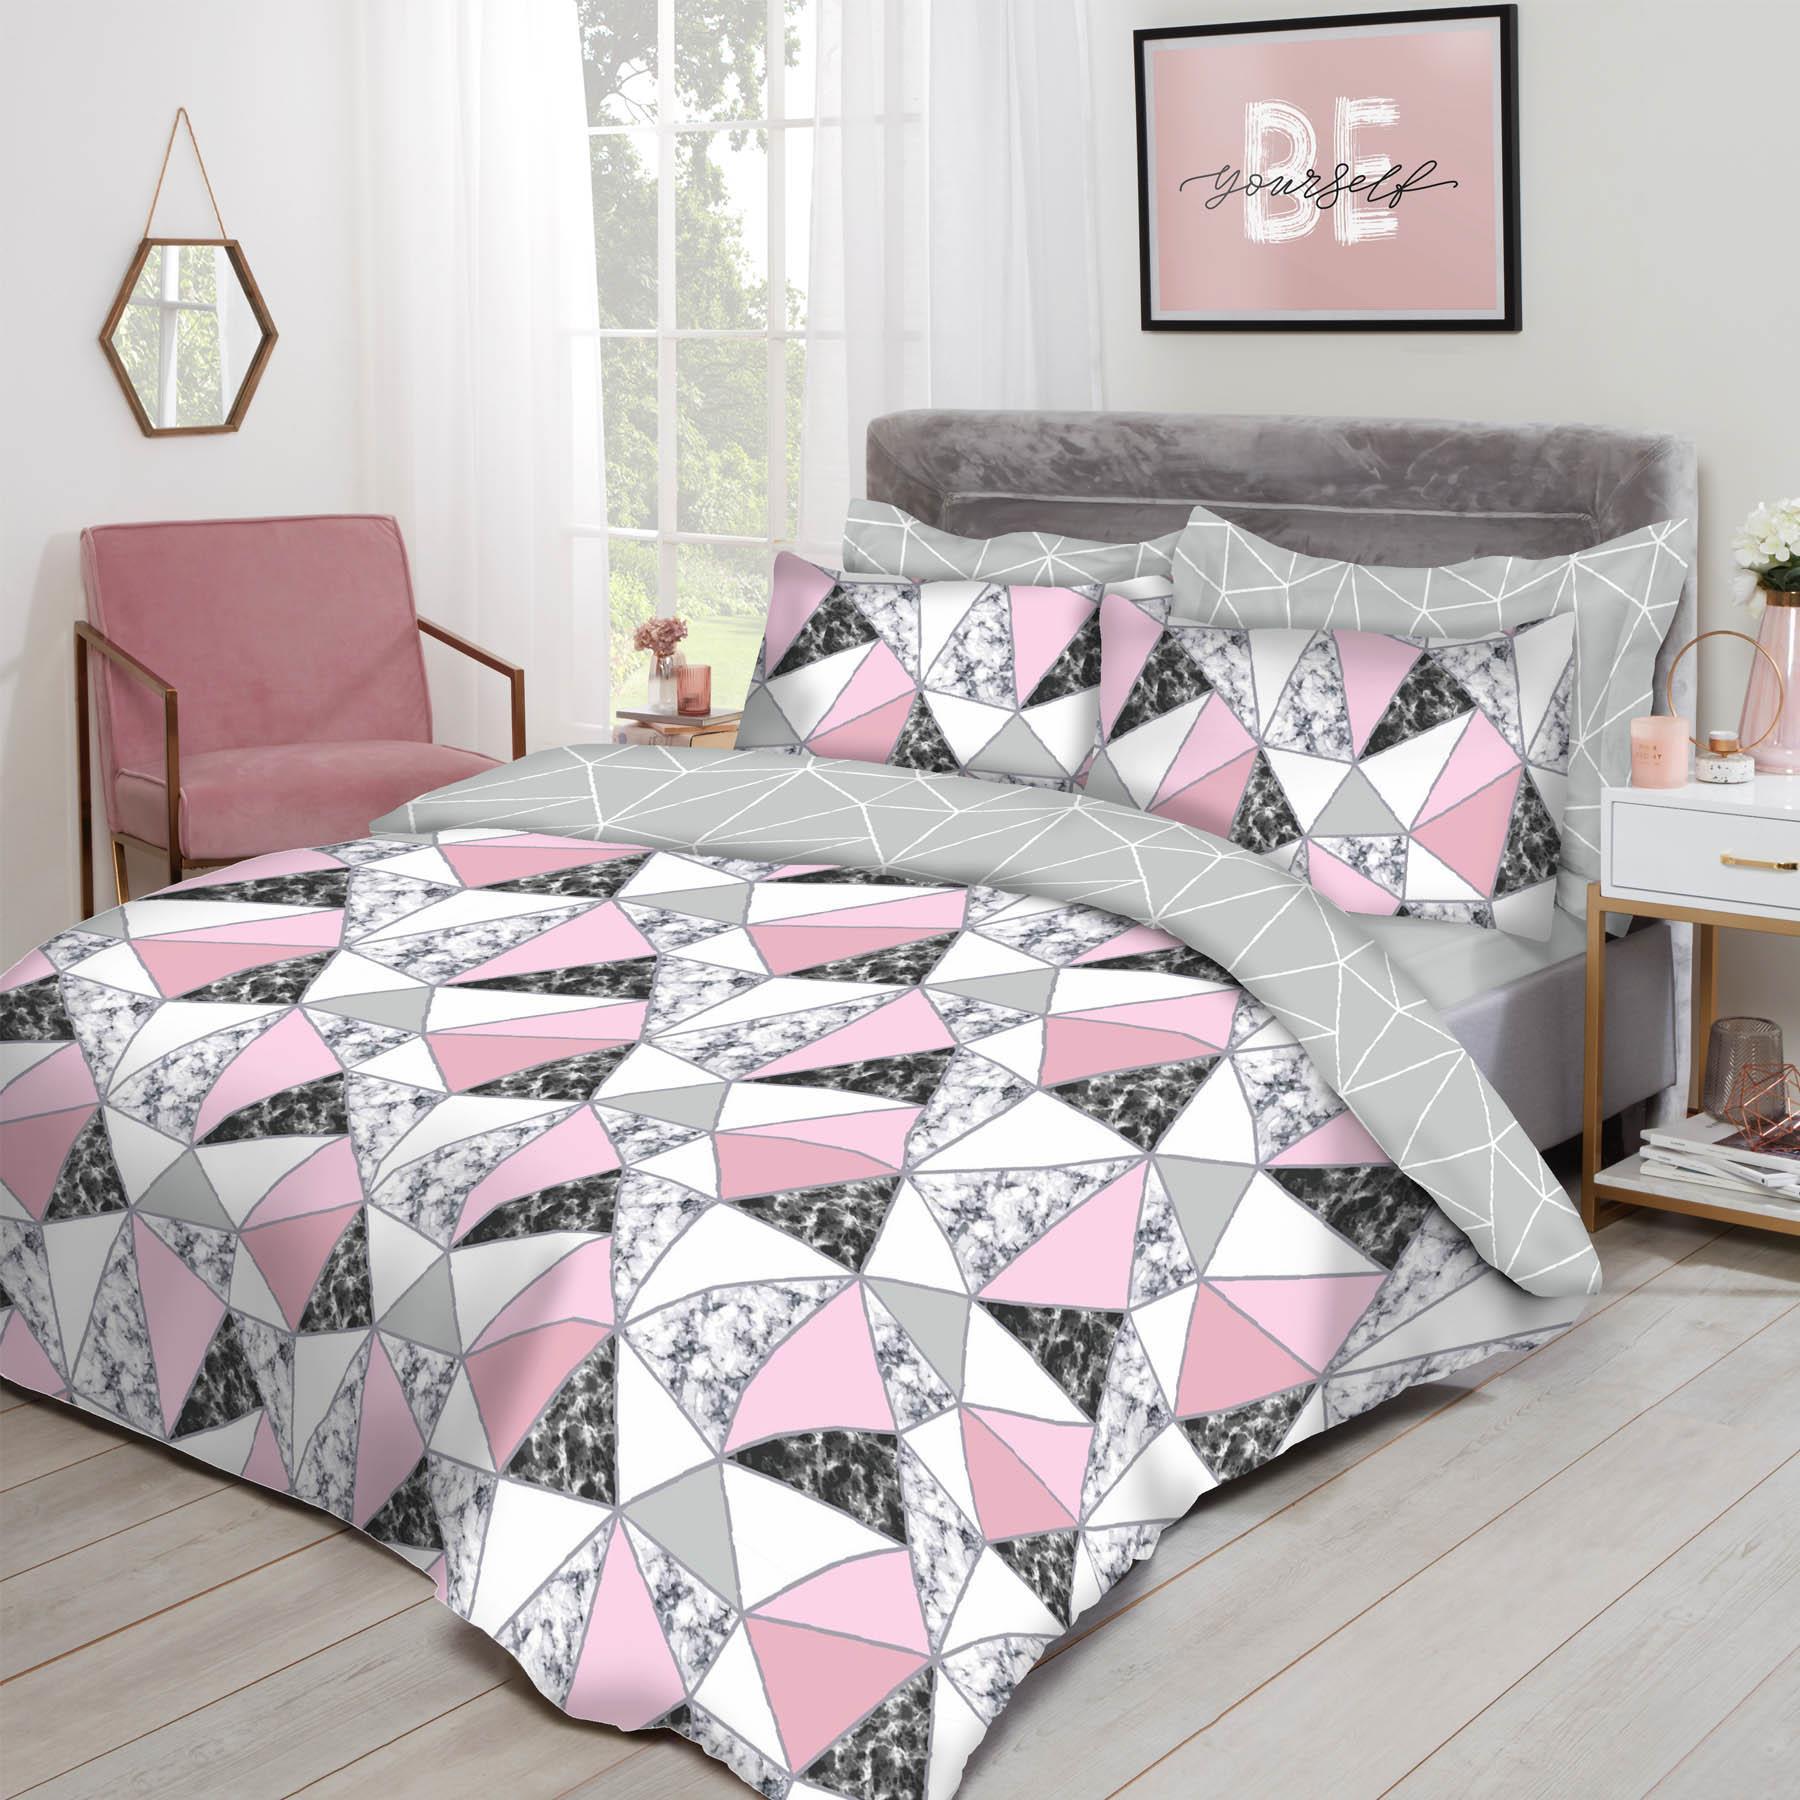 thumbnail 9 - Dreamscene Marble Geometric Duvet Cover with Pillowcase Bedding Set Grey Blush